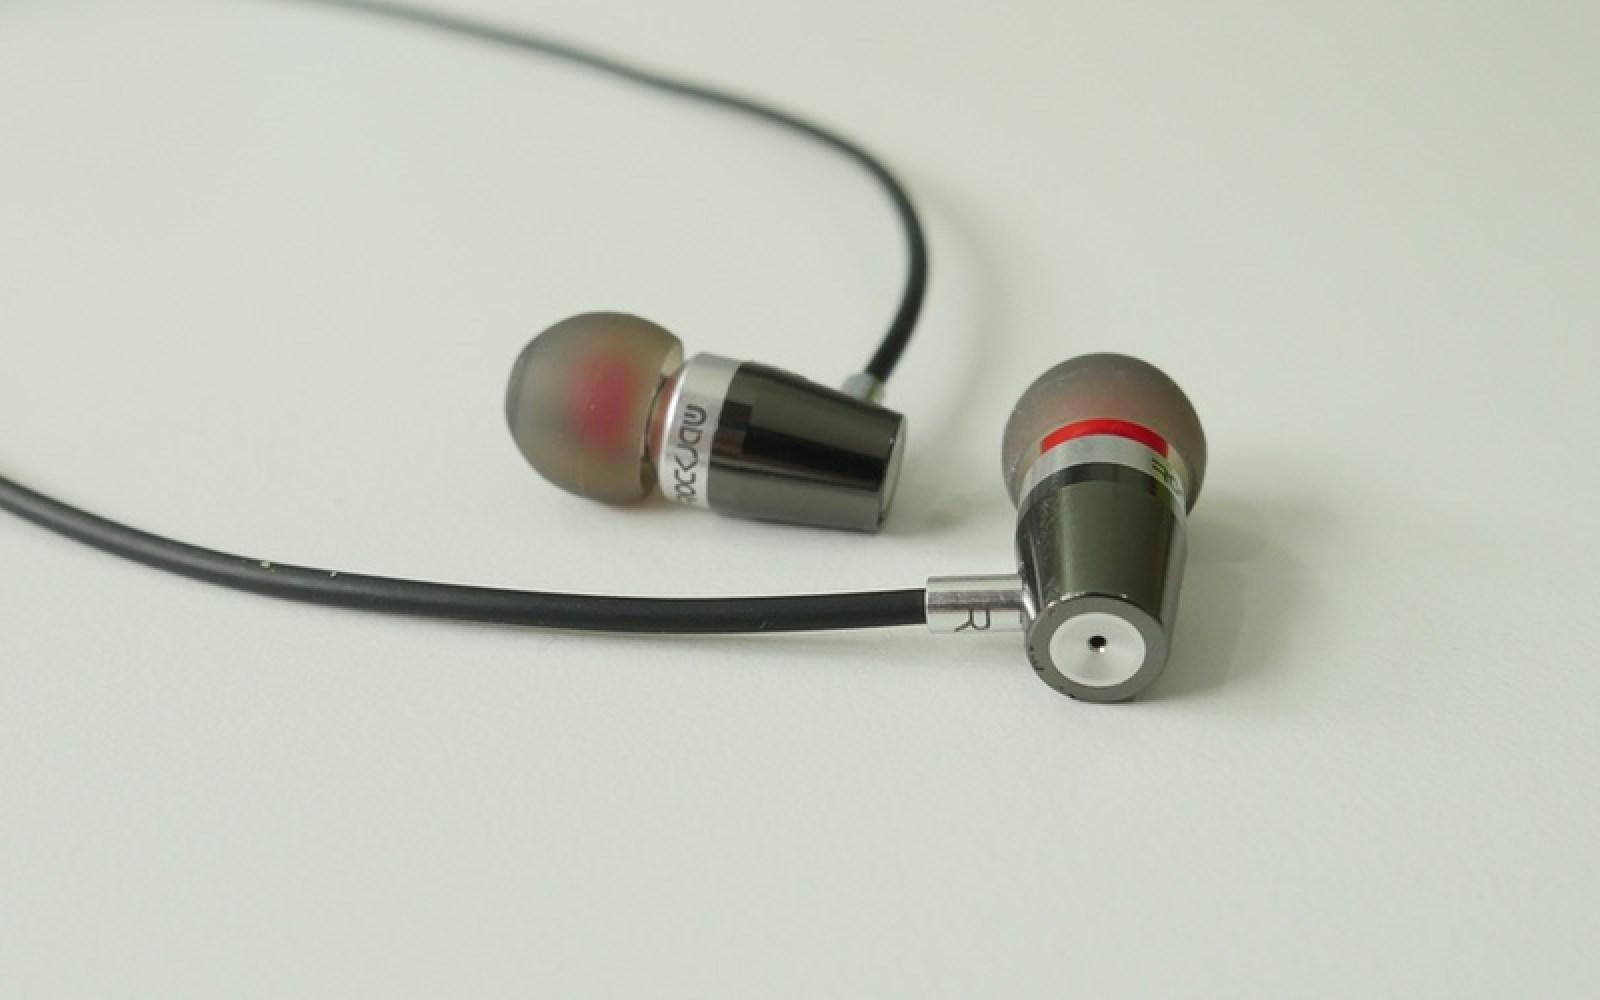 Review: Rock Jaw Alfa Genus V2, audiophile-grade earphones on a budget